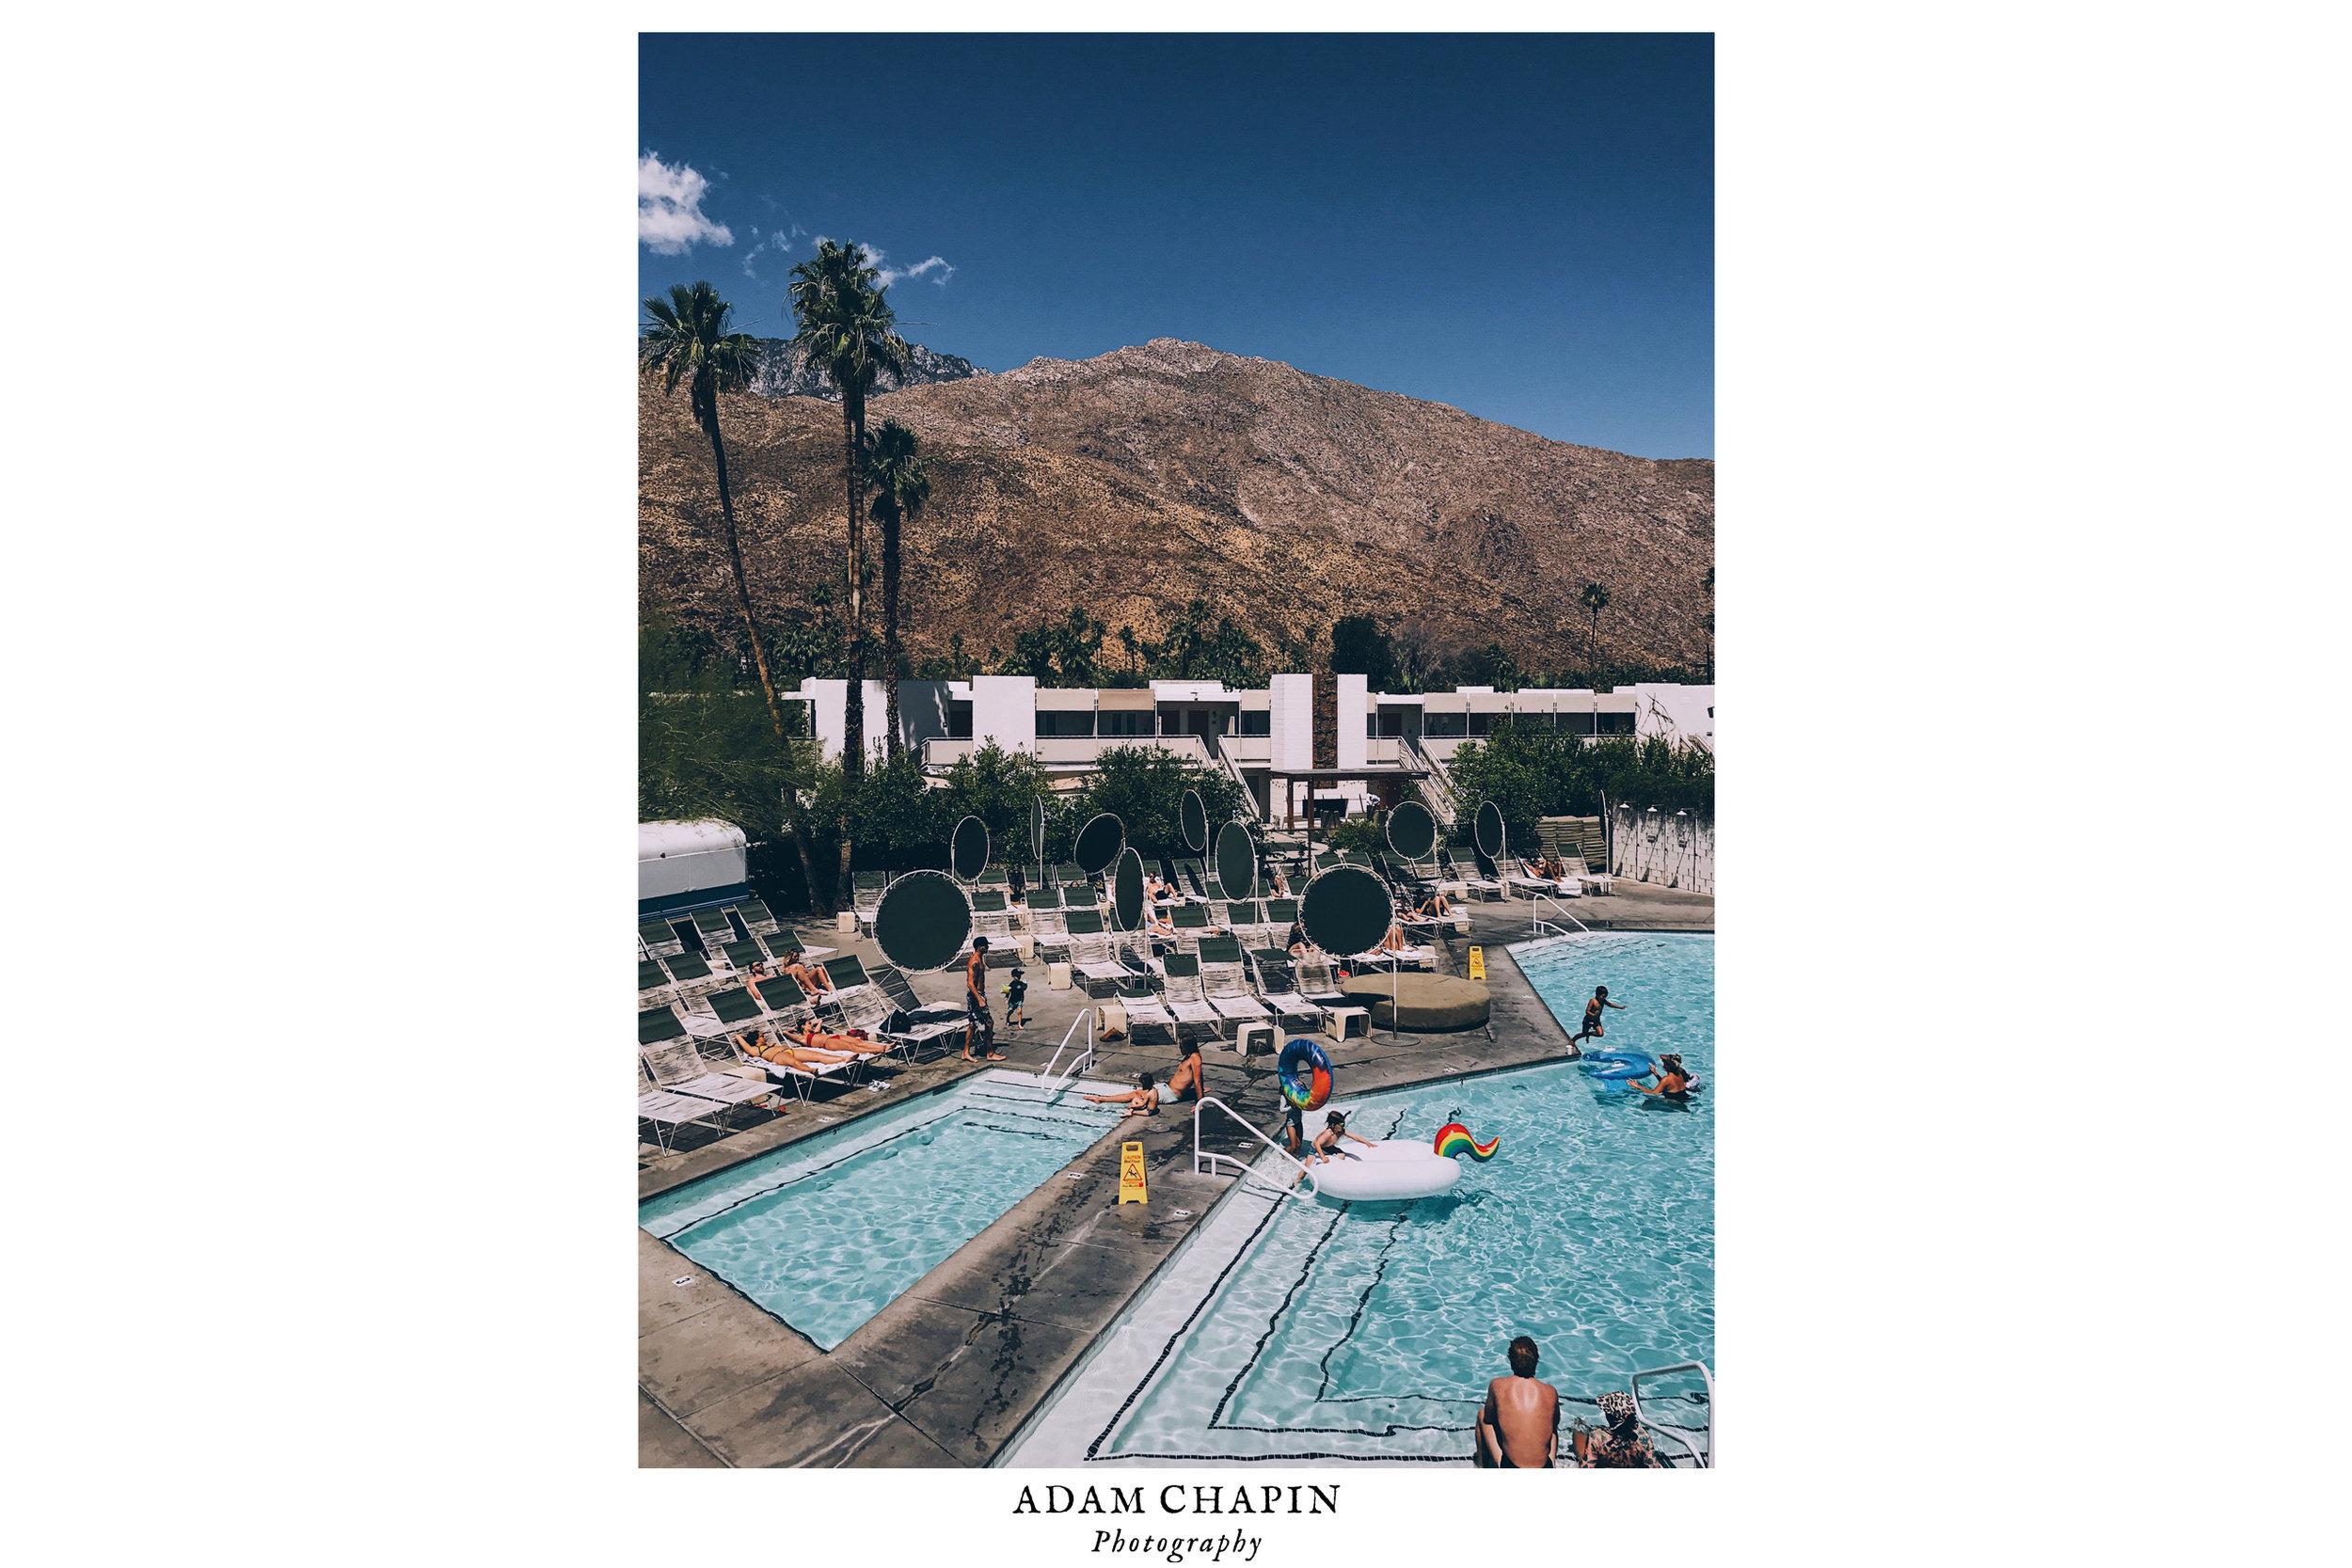 palm-springs-ace-hotel-wedding-venue.jpg